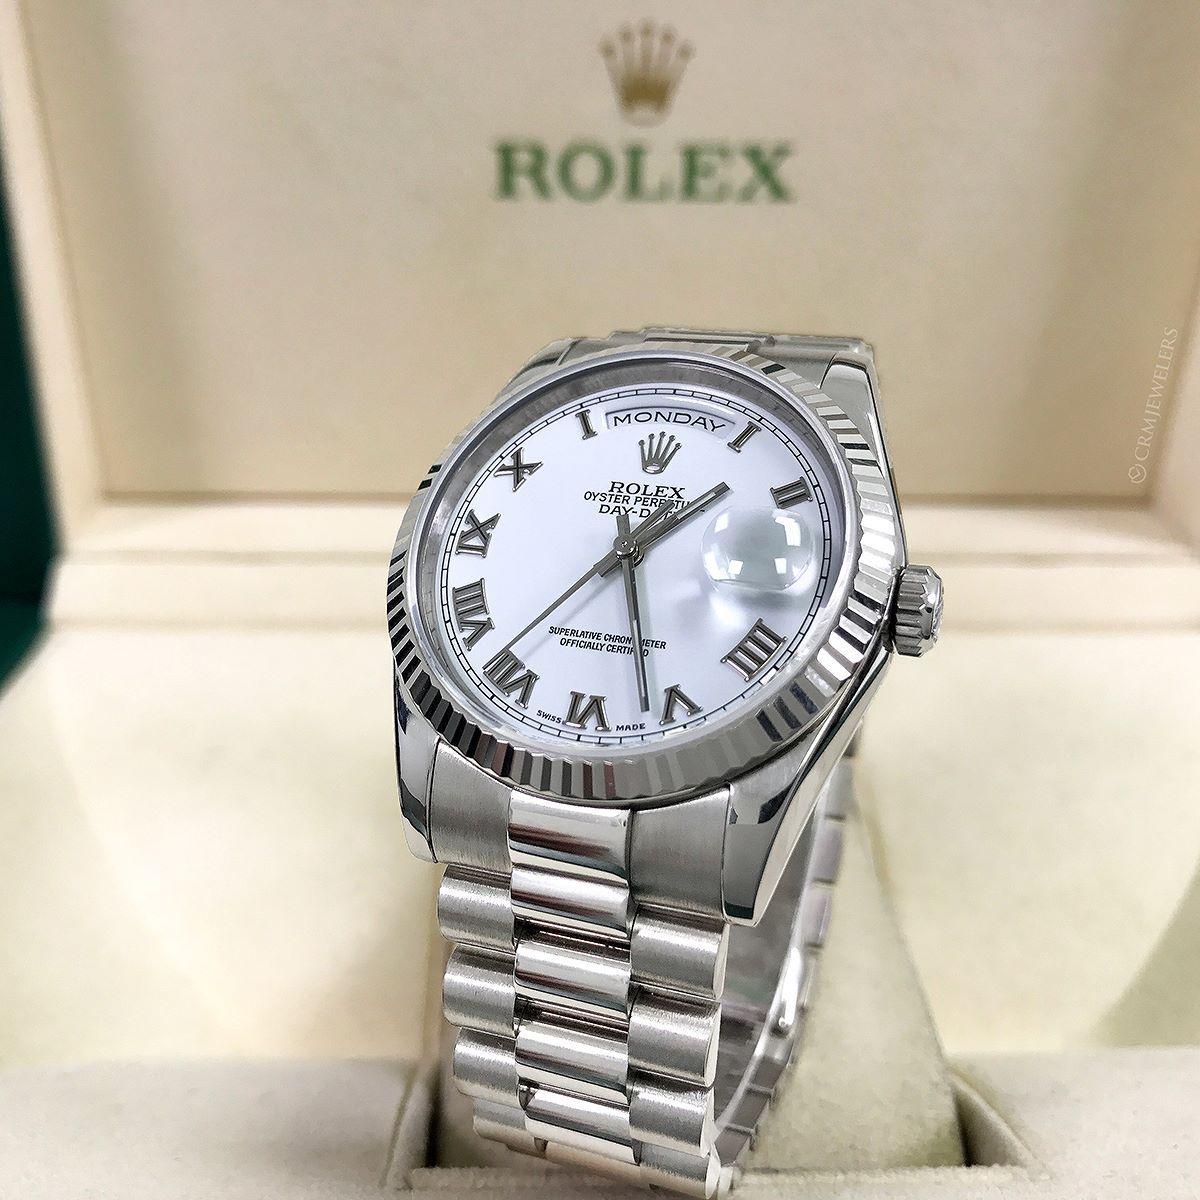 Presi Plain Jane 14350 Asap Approves This Message Rolex Rolex Watches Accessories